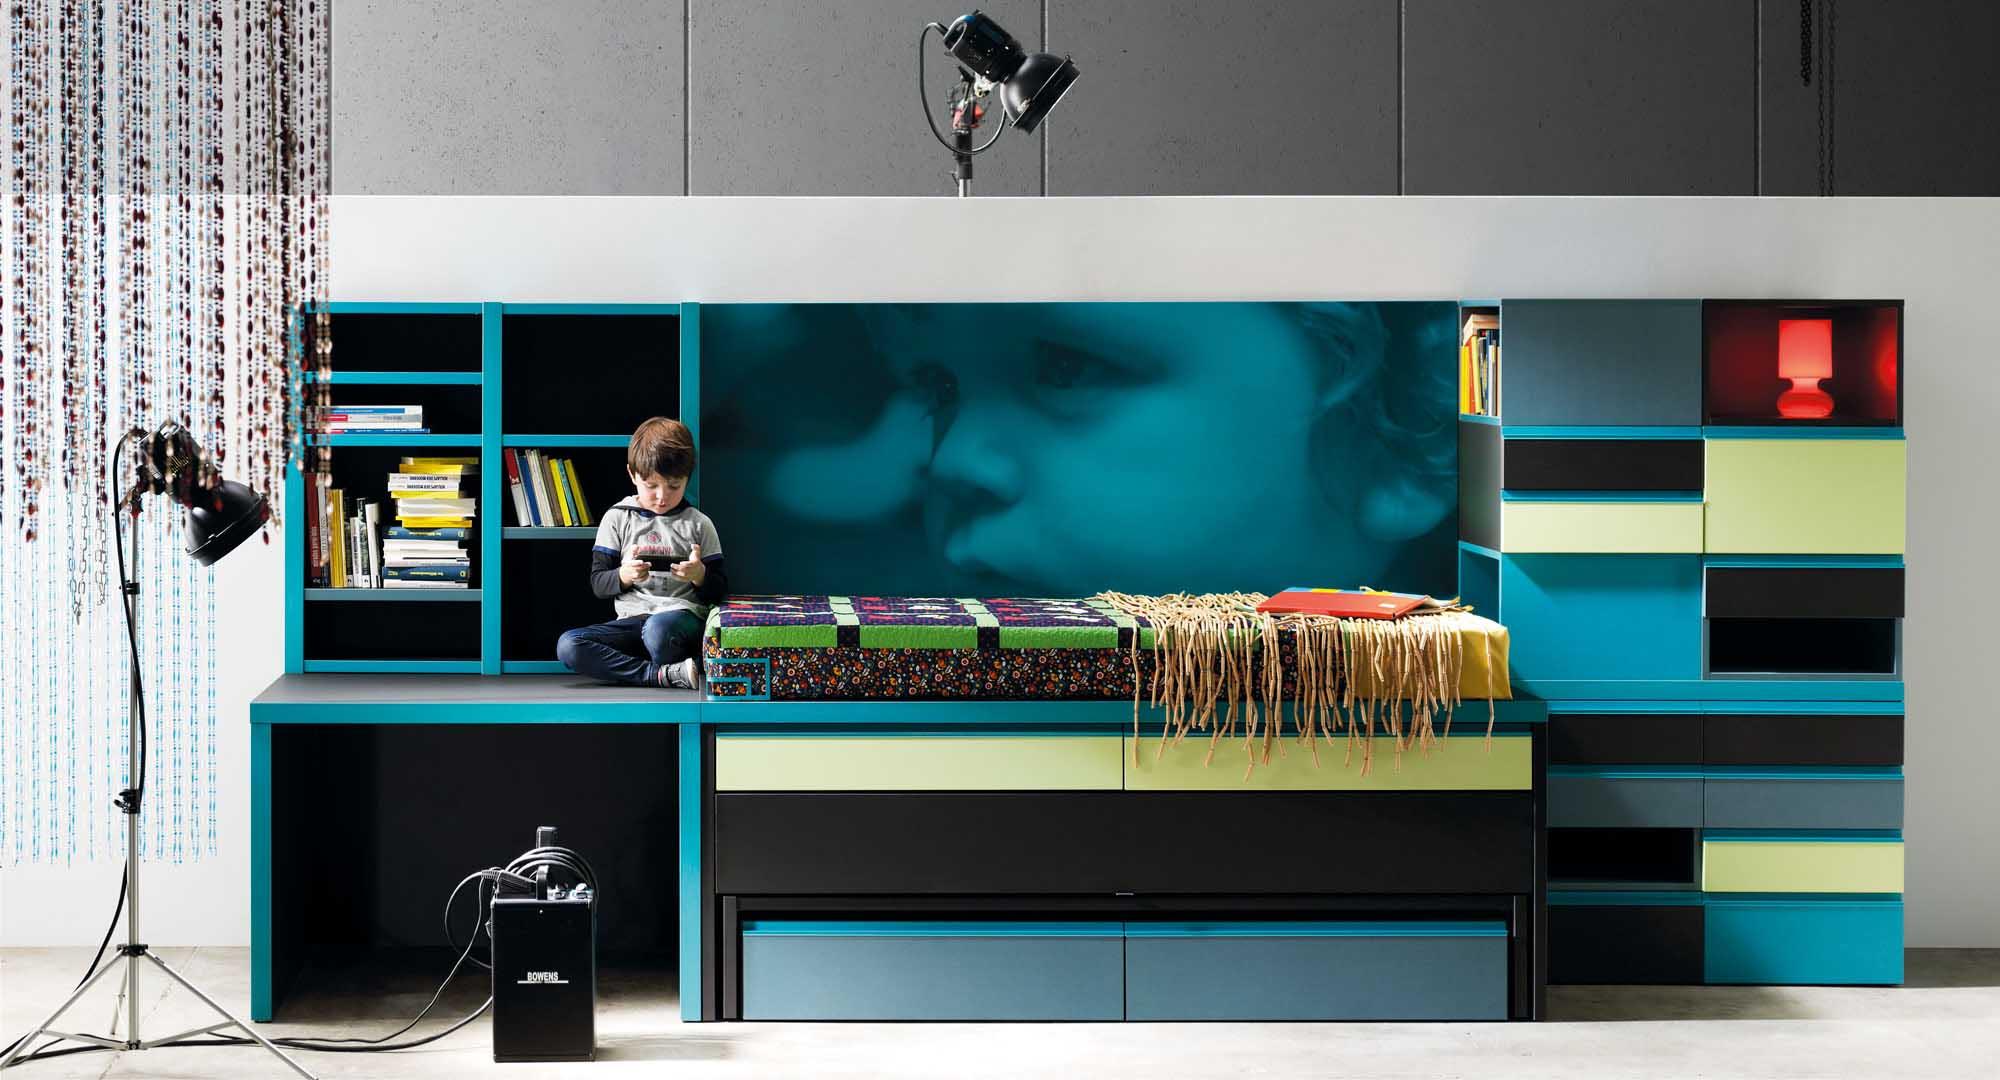 Dormitorio Ni Os Style Moderno Color Amarillo Turquesa Negro # Muebles Turquesa